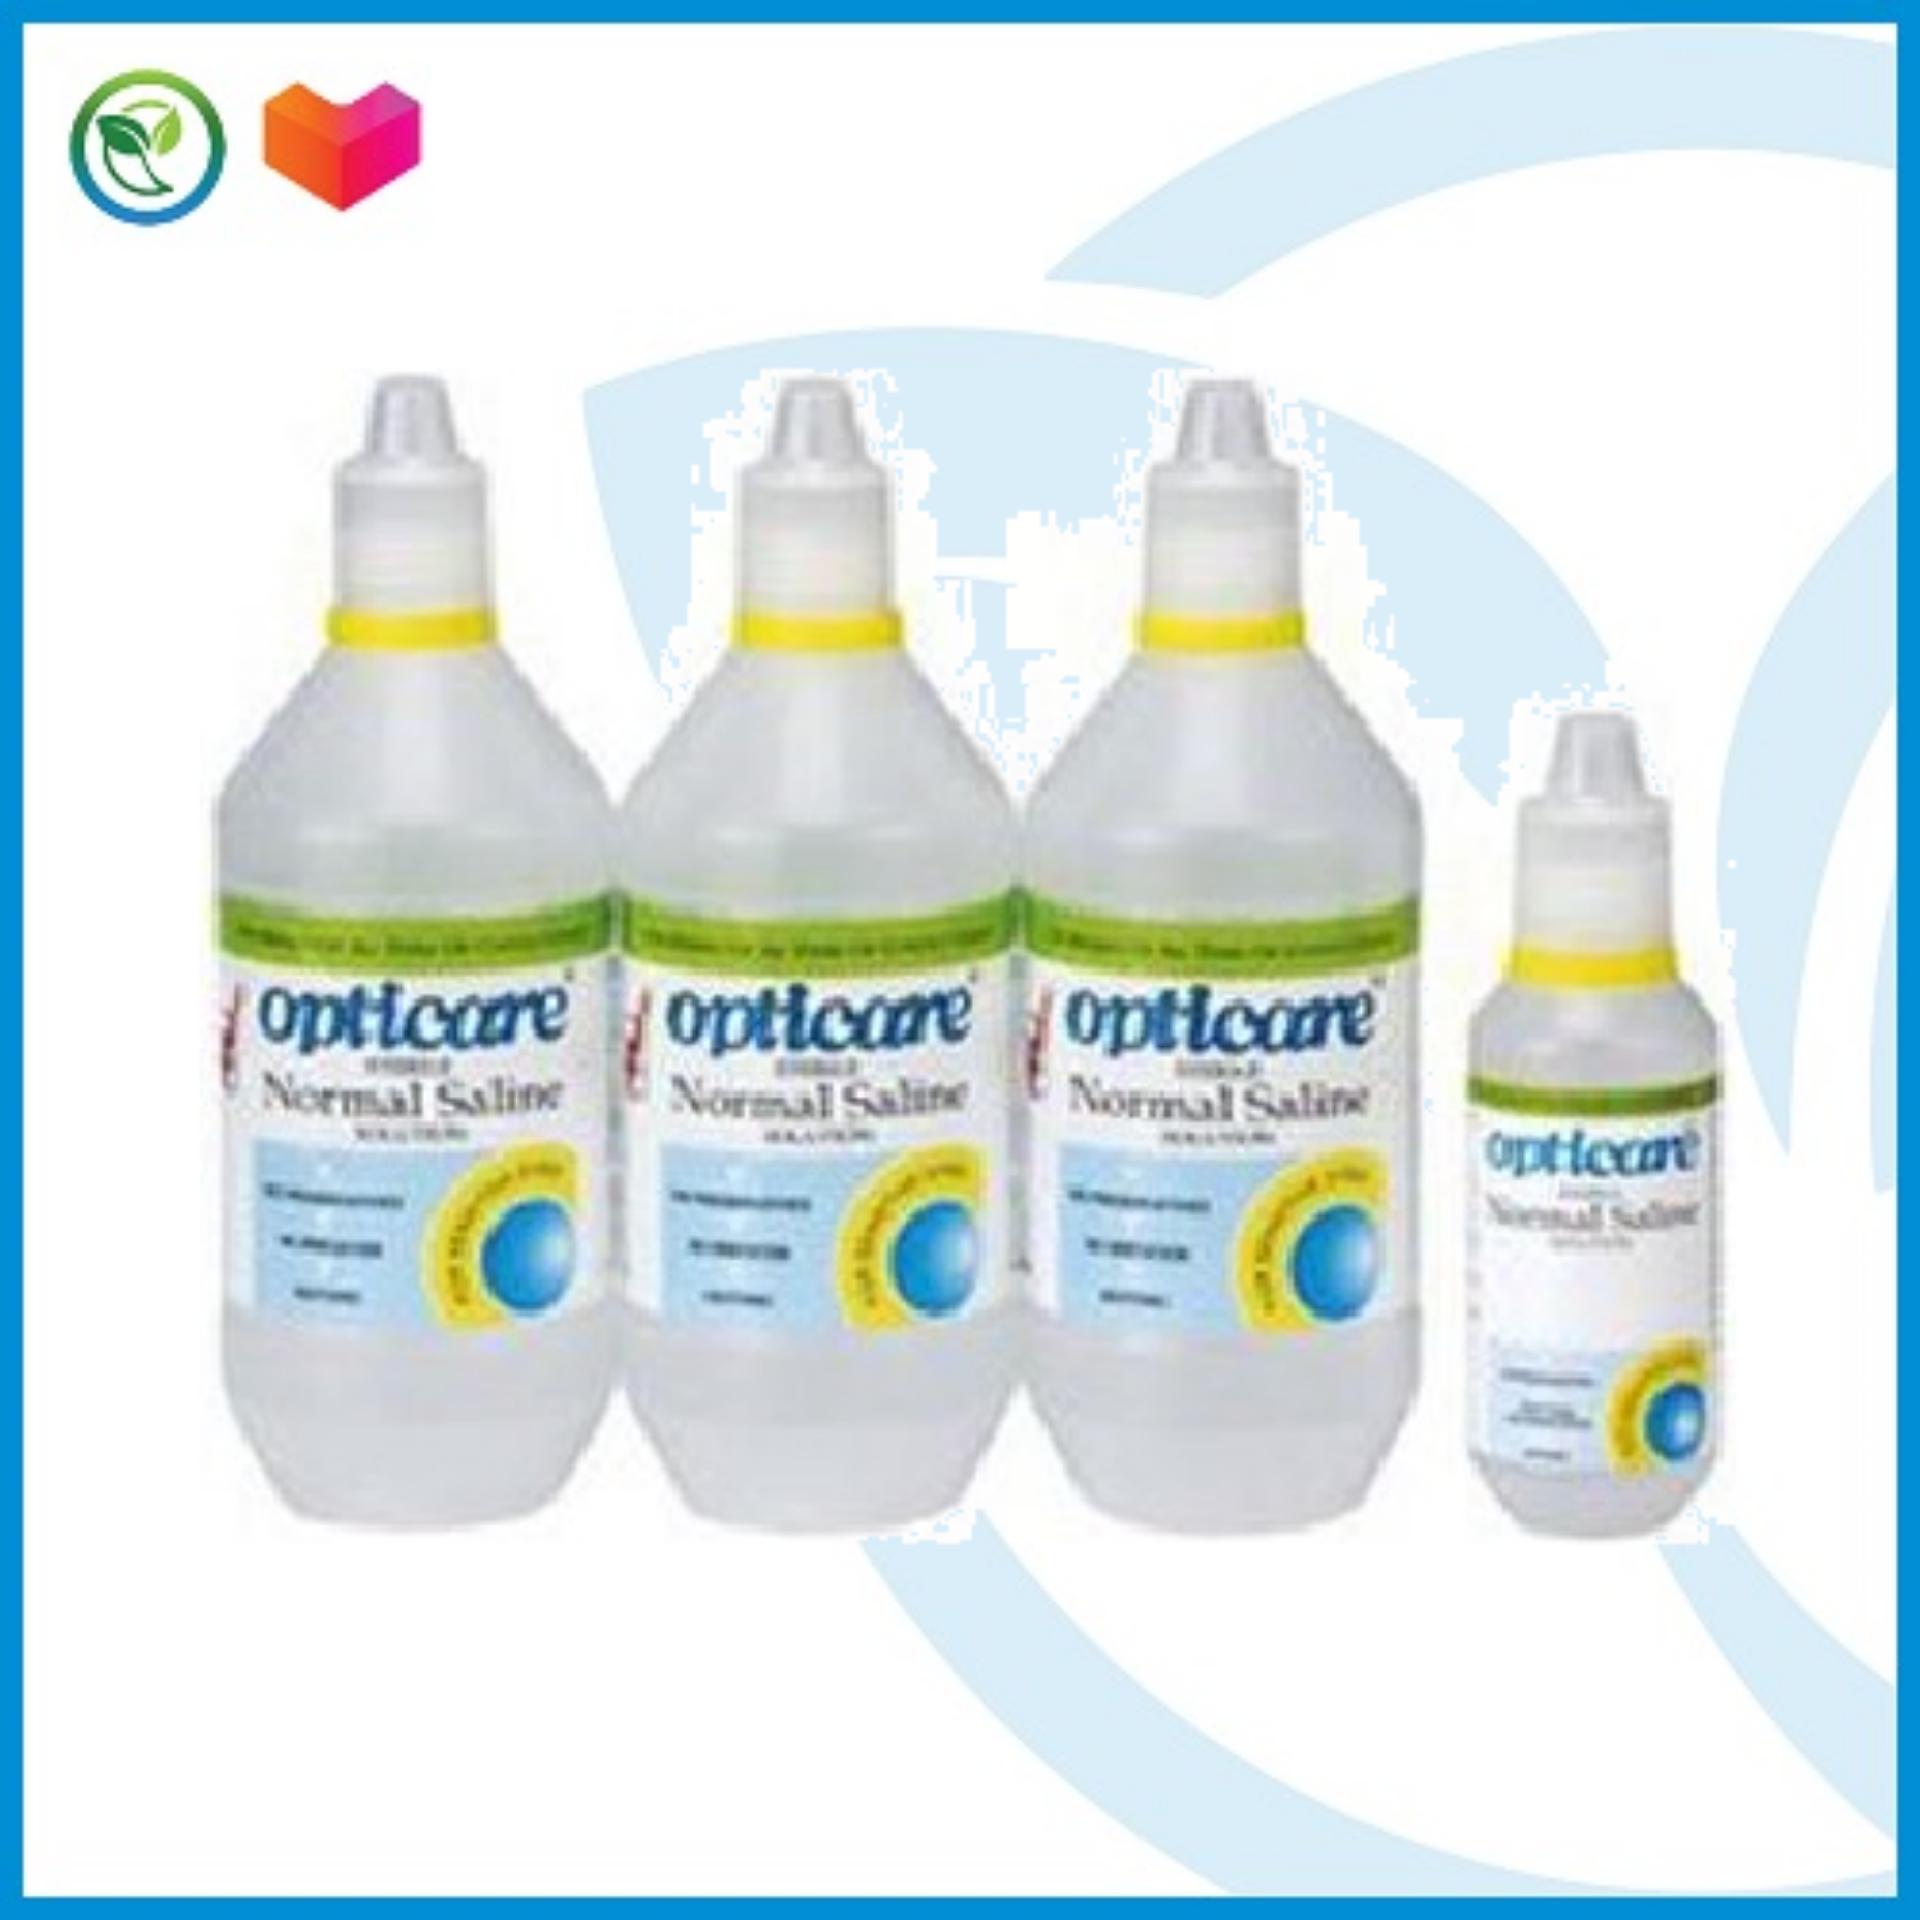 Opticare Normal Saline Solution 500ml x 3 + 120ml